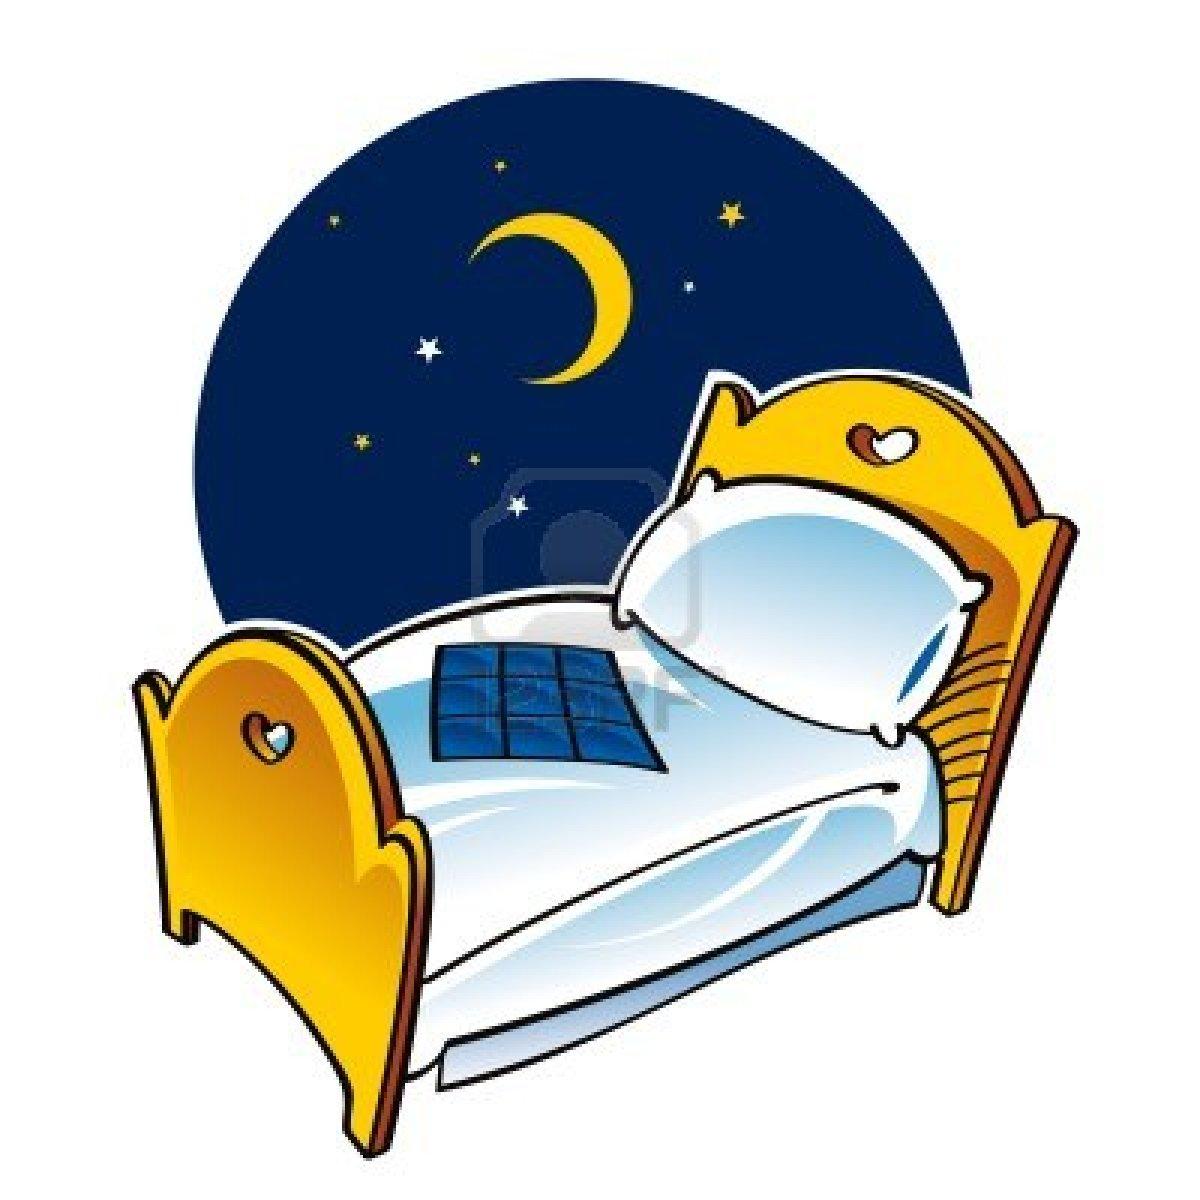 hight resolution of 1200x1200 sleeping clipart sleep early